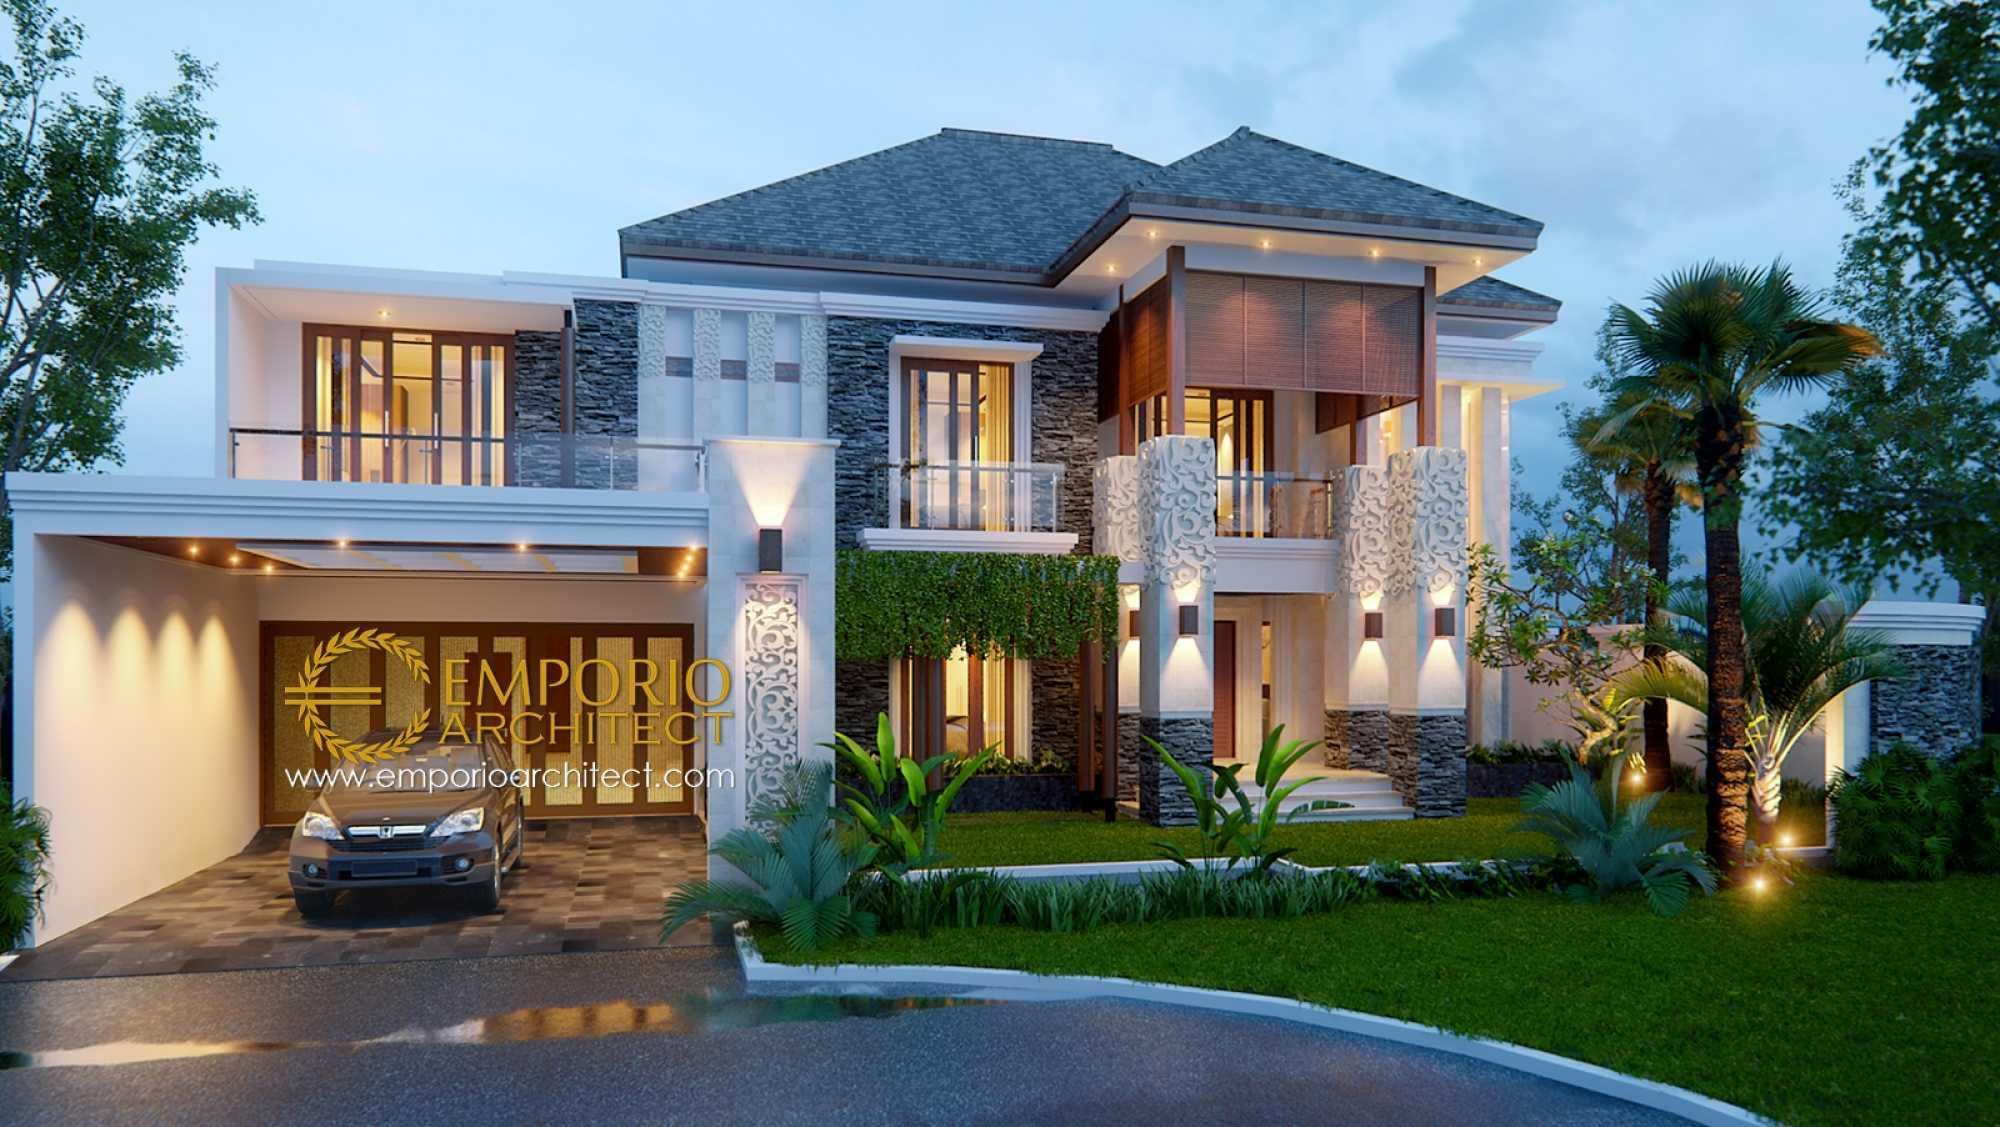 Emporio Architect Desain Rumah Villa Bali Tropis 395 @ Bekasi Bekasi, Kota Bks, Jawa Barat, Indonesia Bekasi, Kota Bks, Jawa Barat, Indonesia Emporio-Architect-Desain-Rumah-Villa-Bali-Tropis-395-Bekasi Tropical 76937